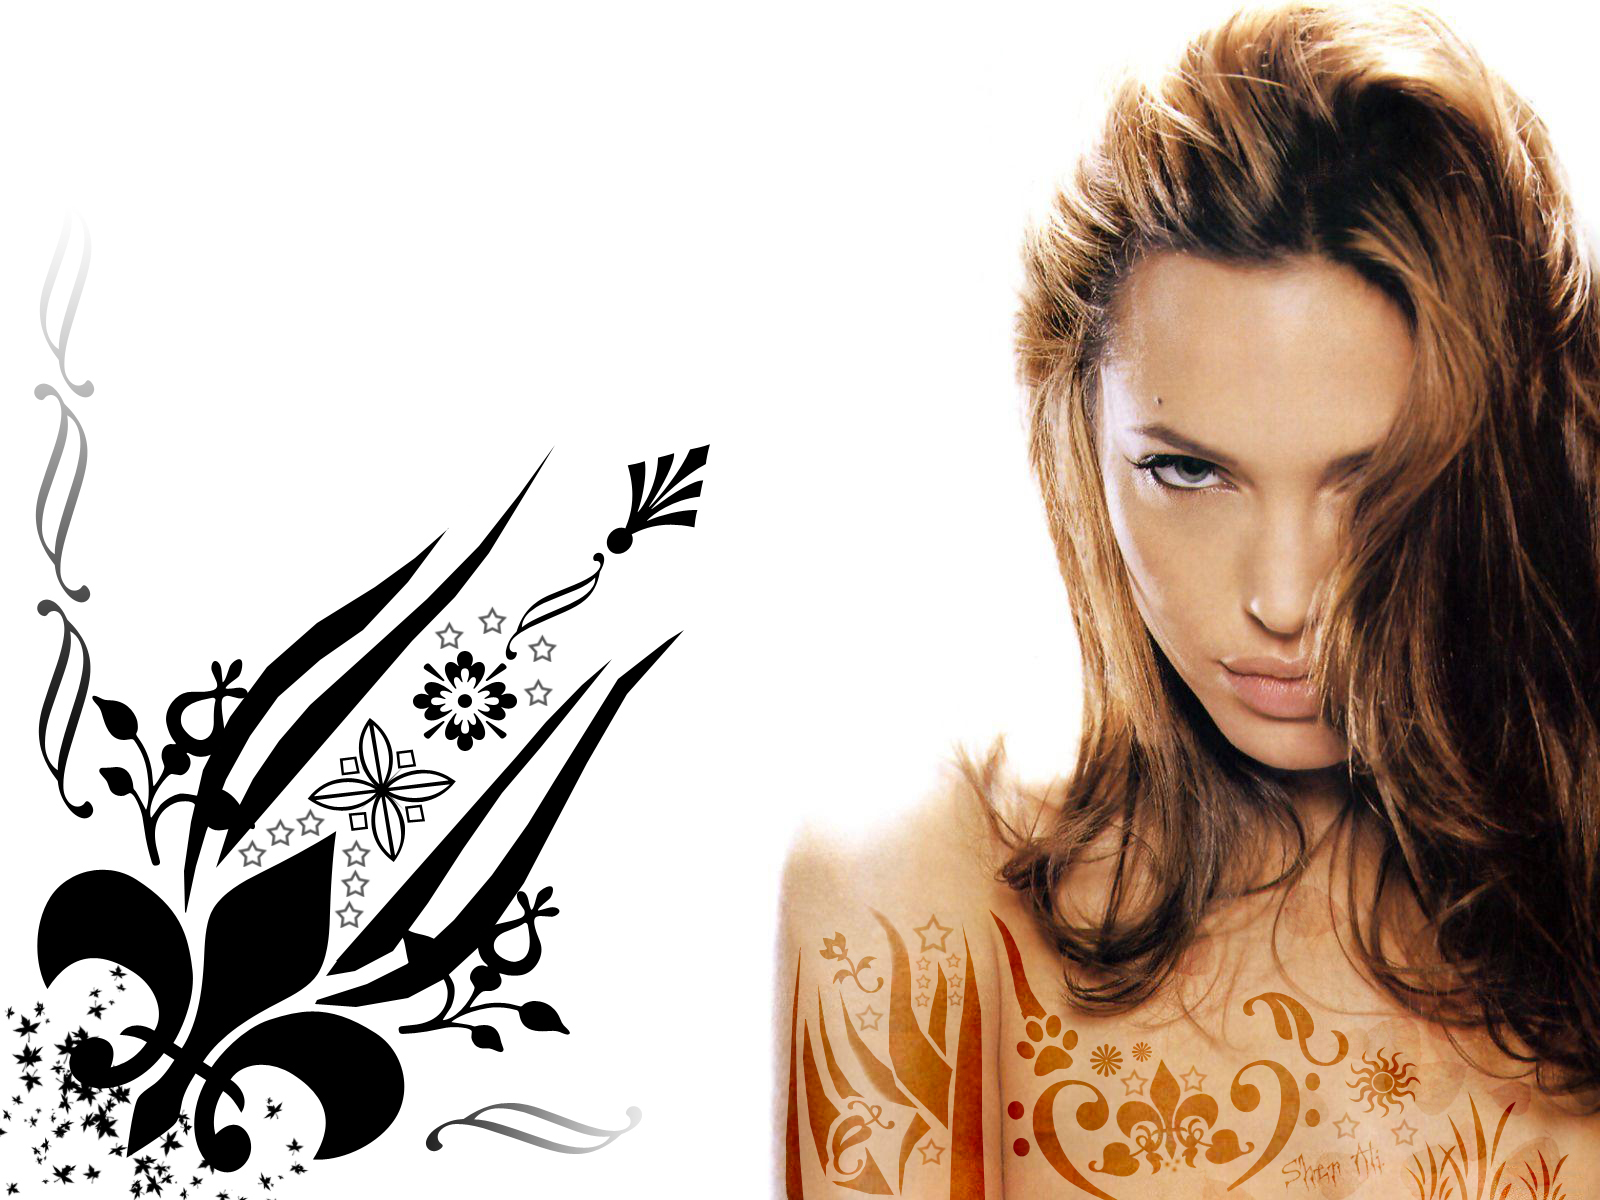 angelina jolie wallpaper | free hd wallpapers